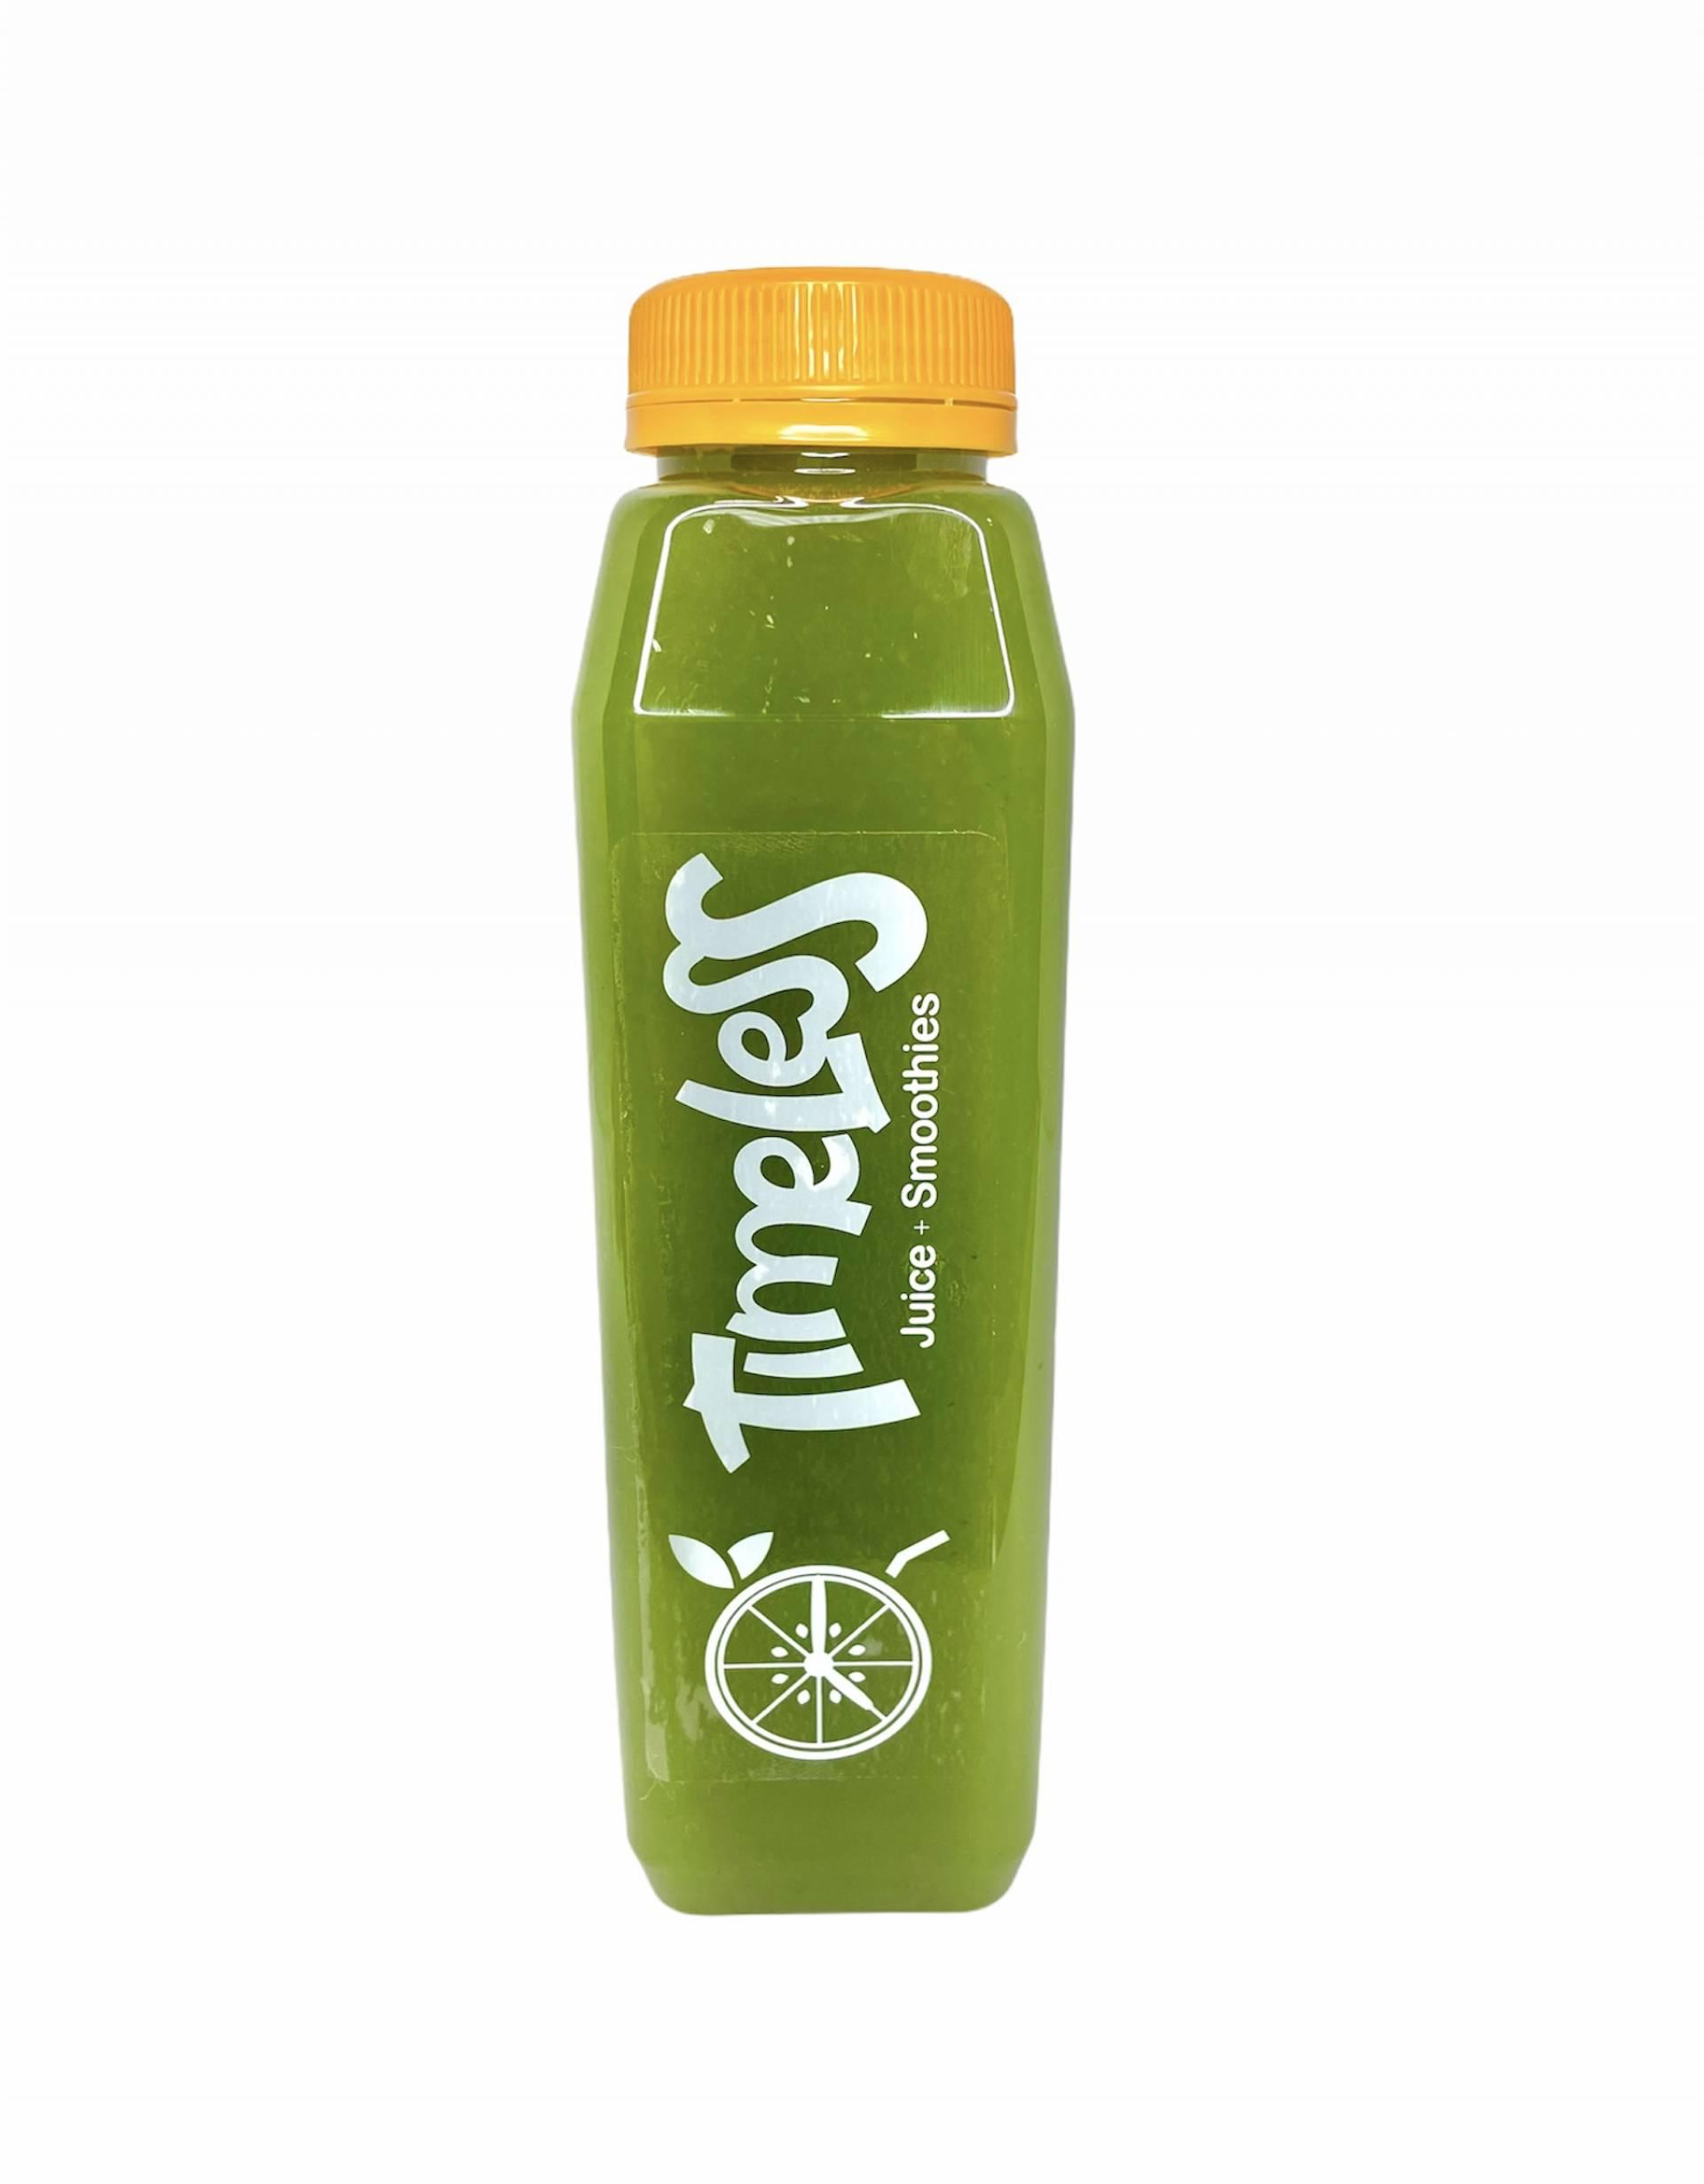 Timeless Juice - Pine Green